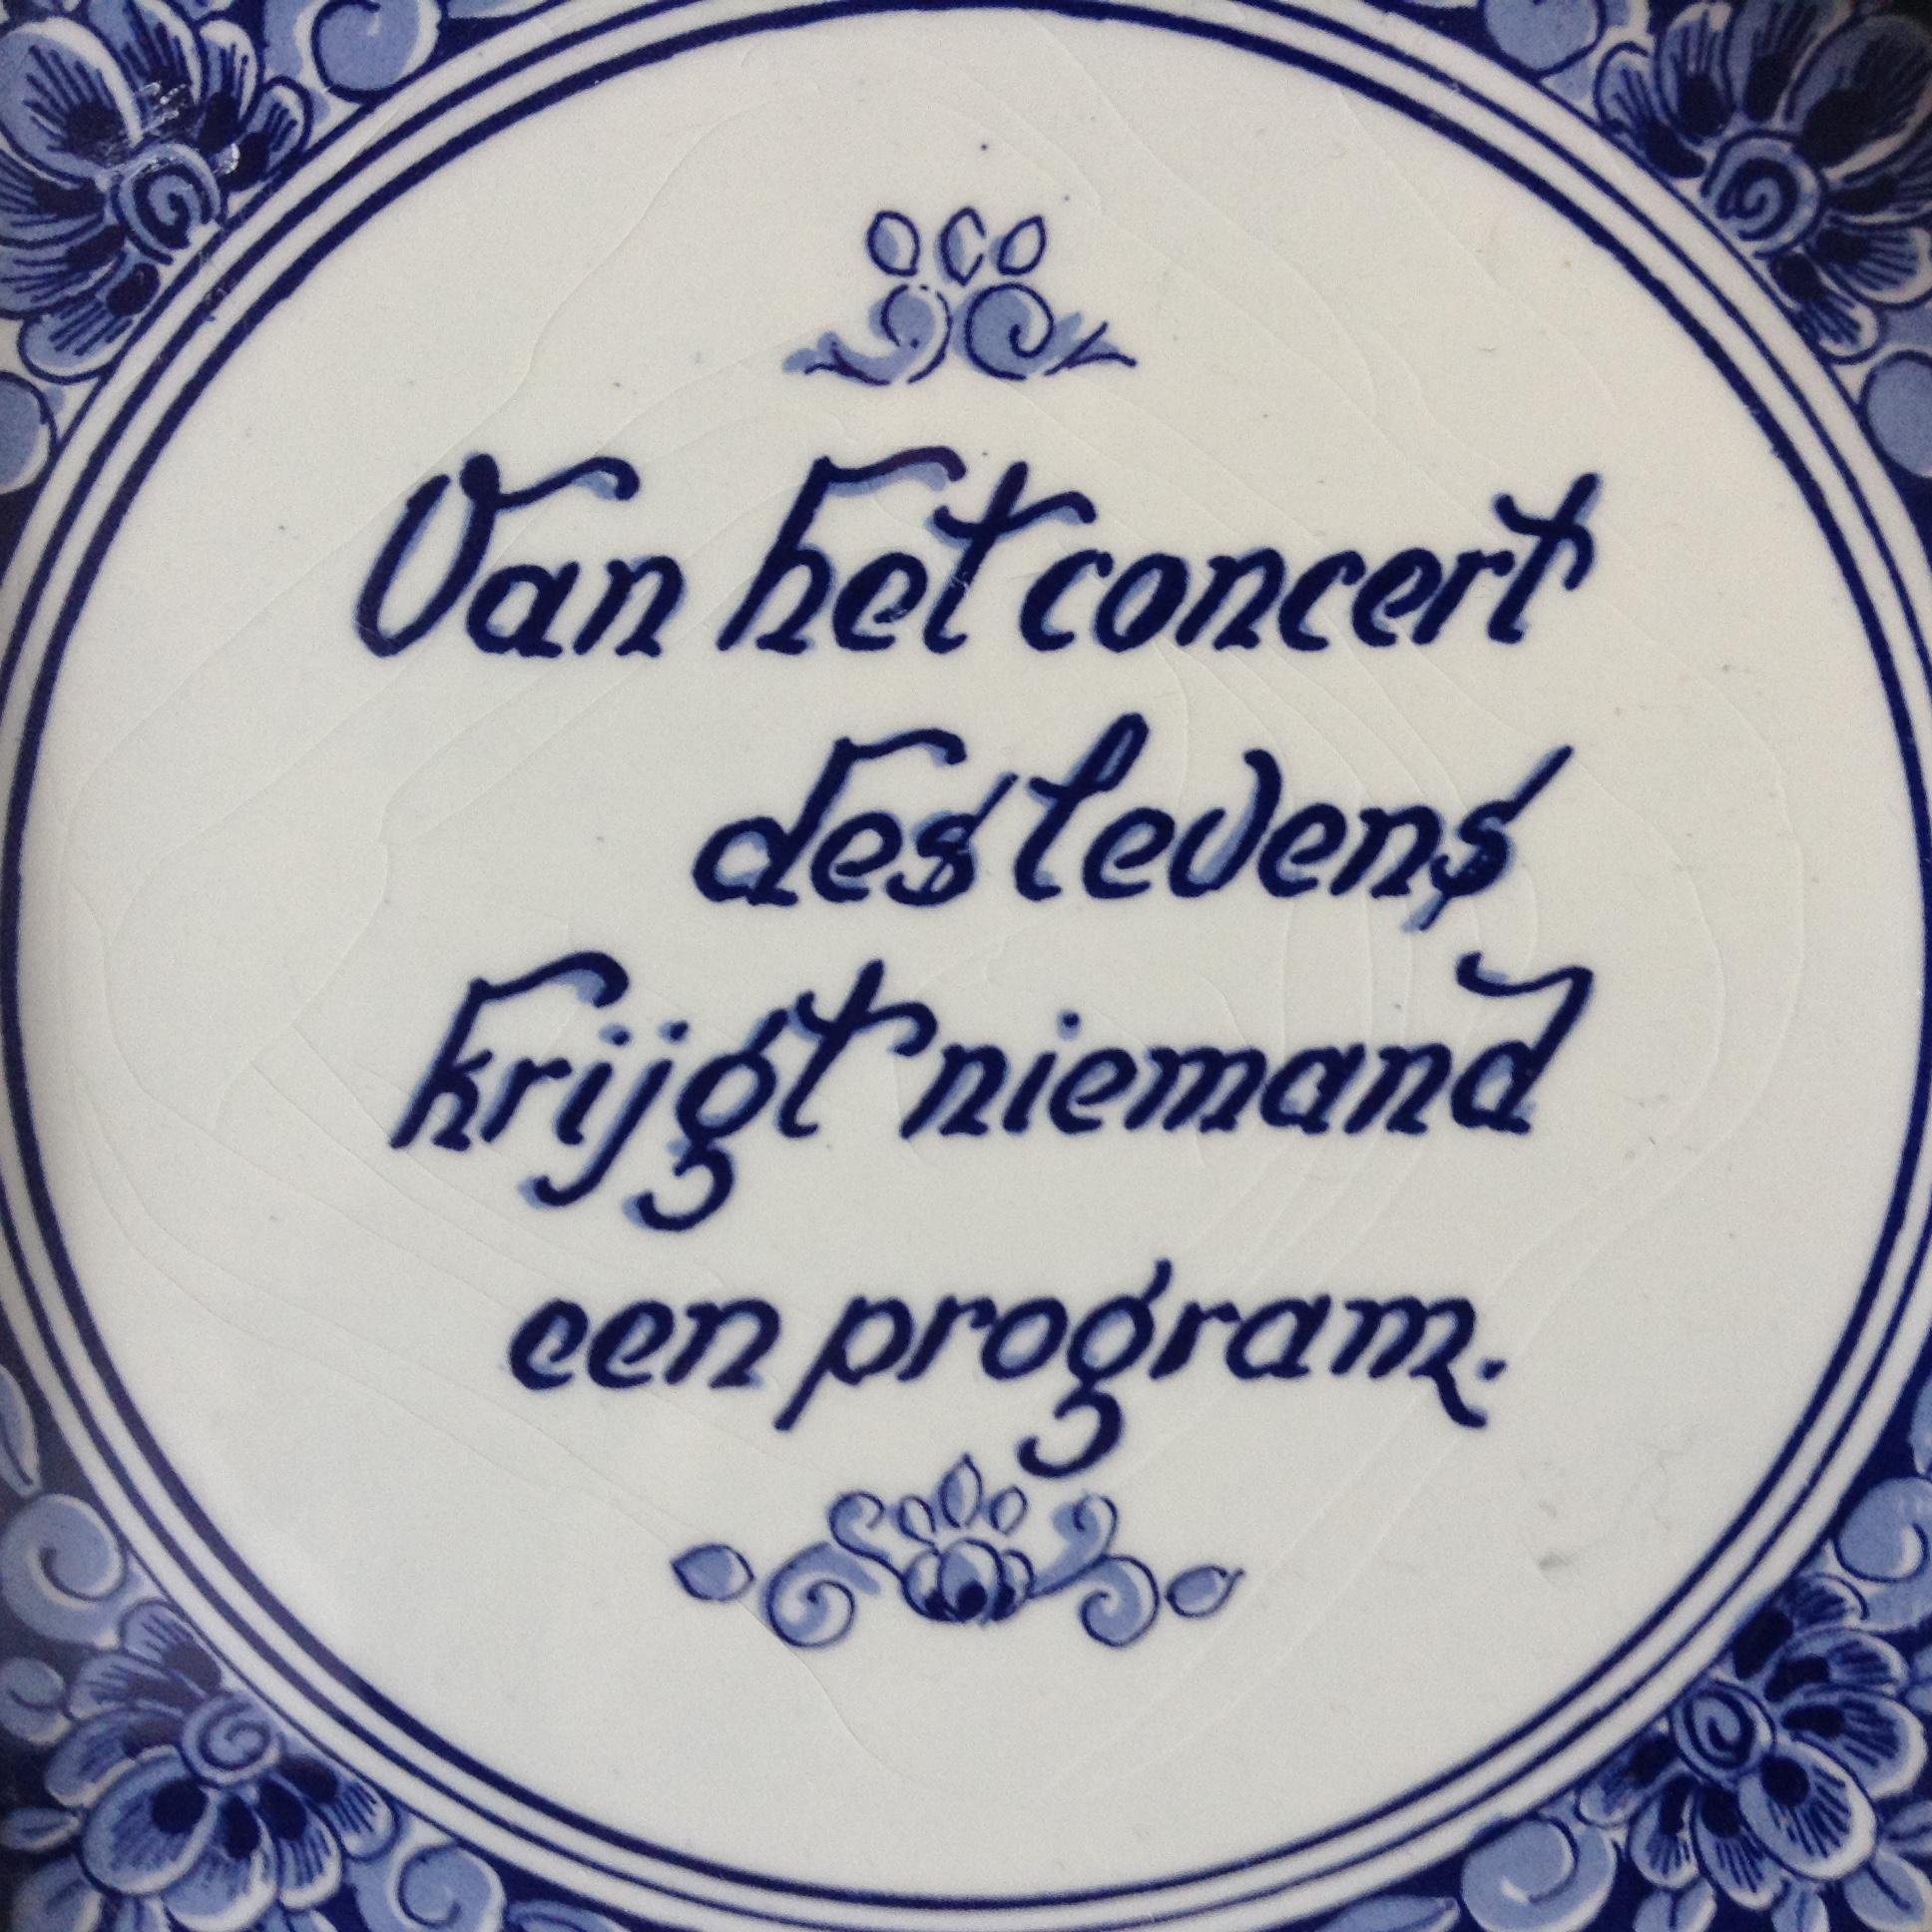 Top 10 Most Popular Dutch Tile Sayings Dutch Community